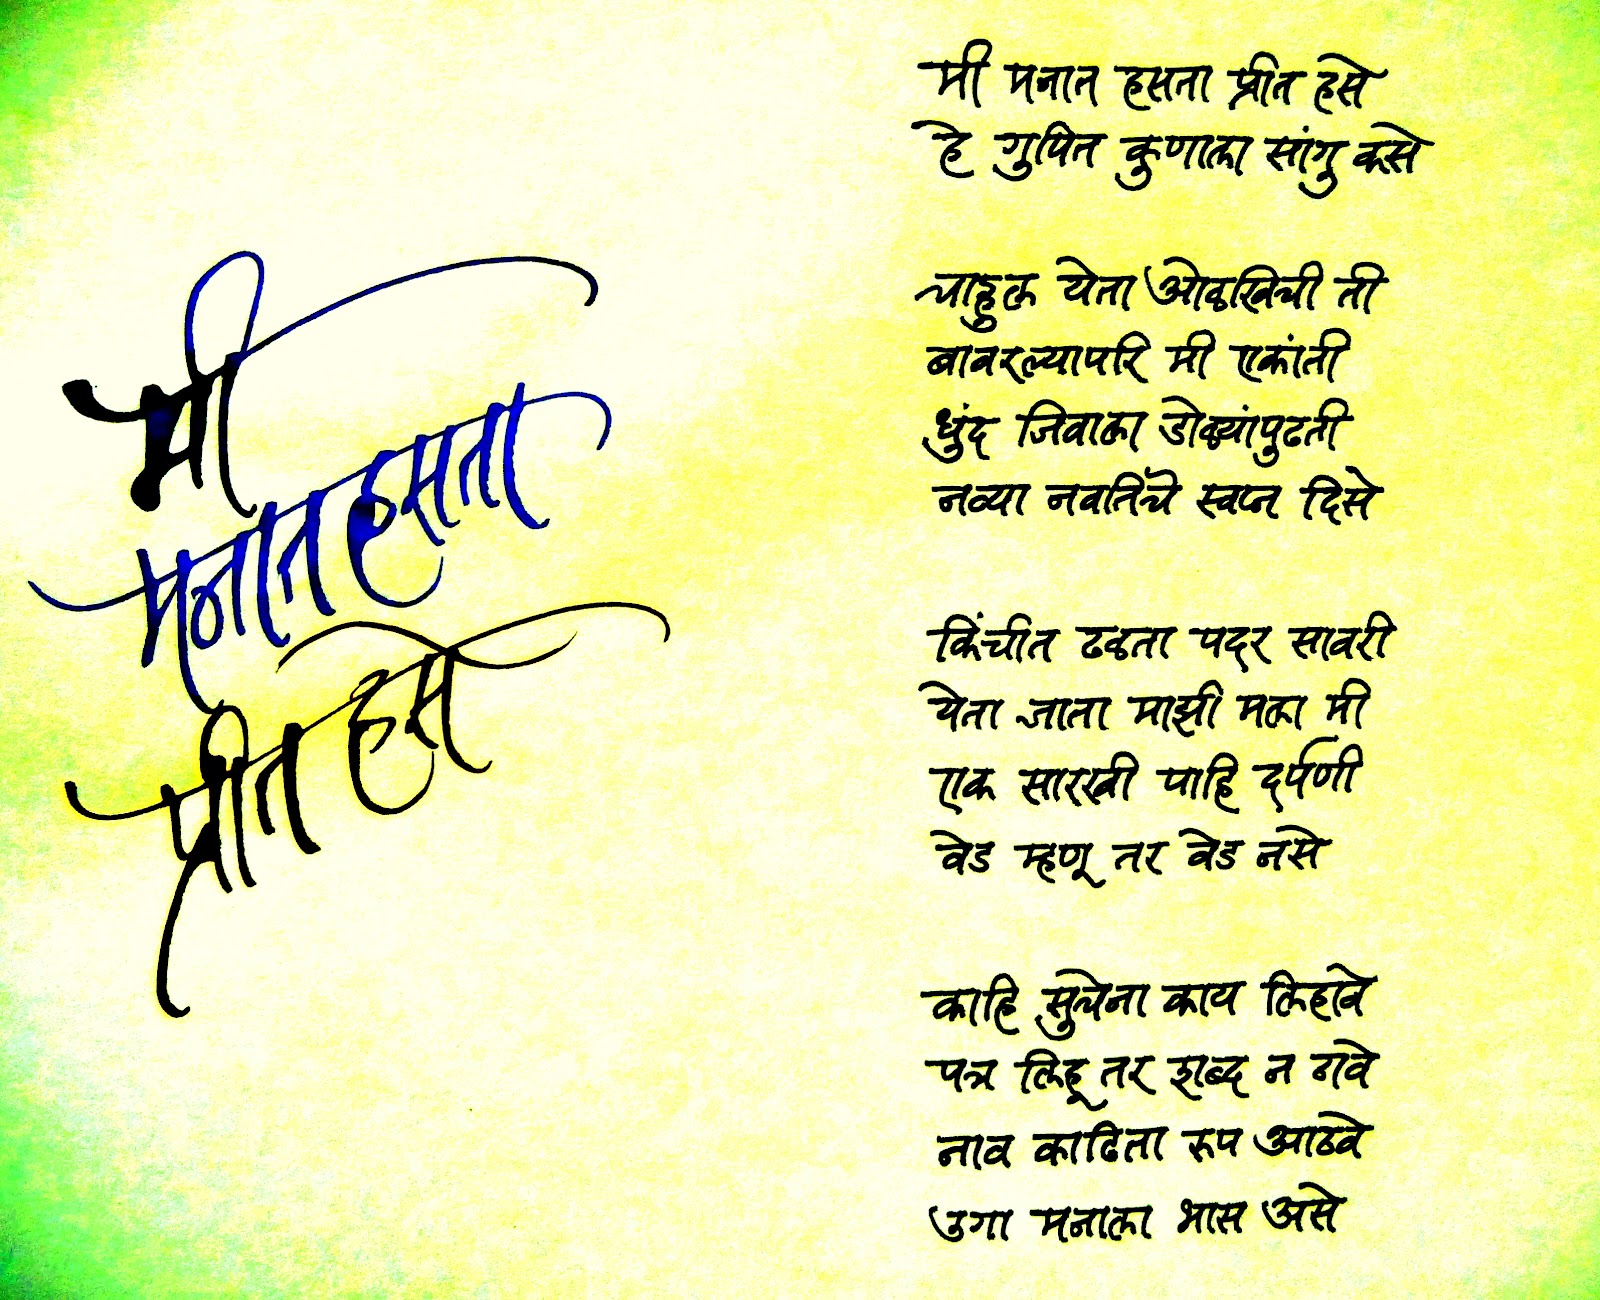 Marathi Calligraphy Writing